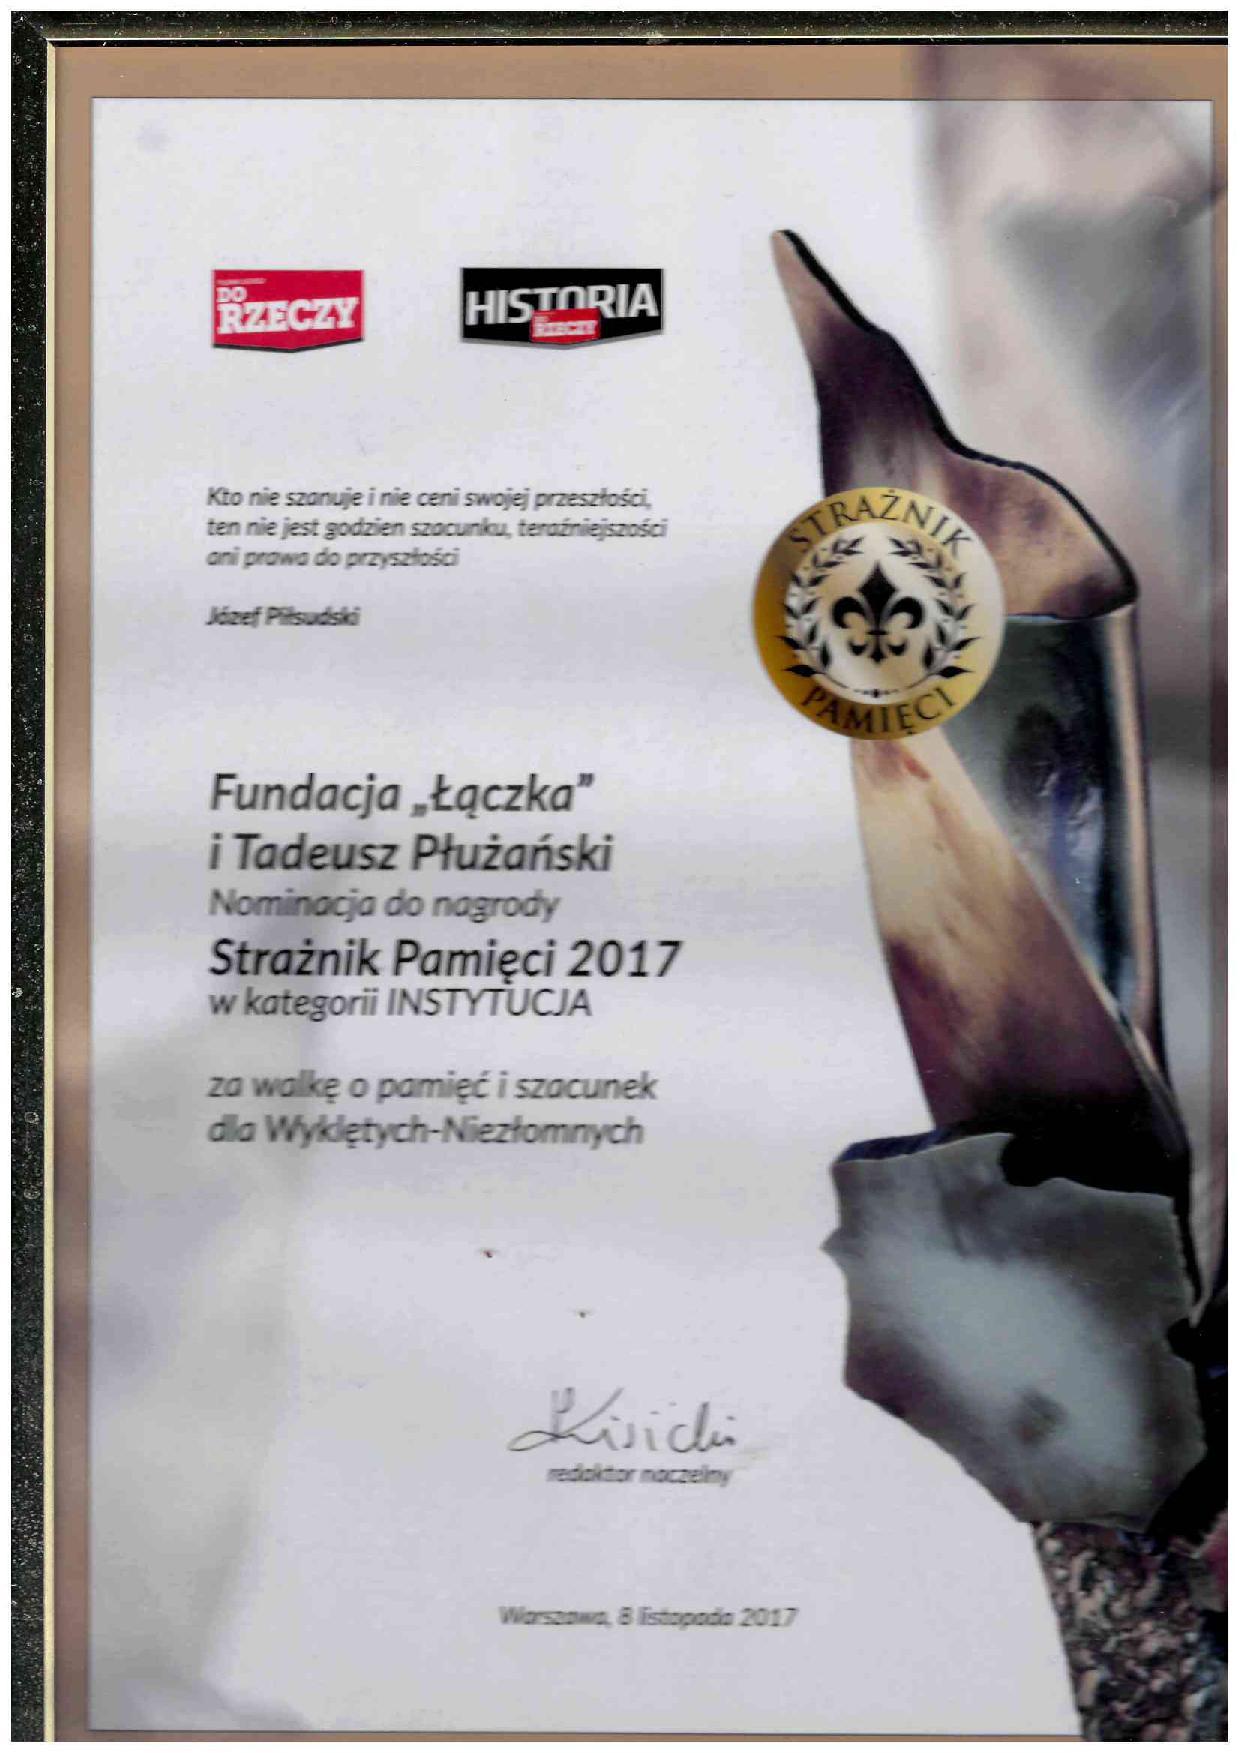 Nominacja do nagrody Strażnik Pamięci